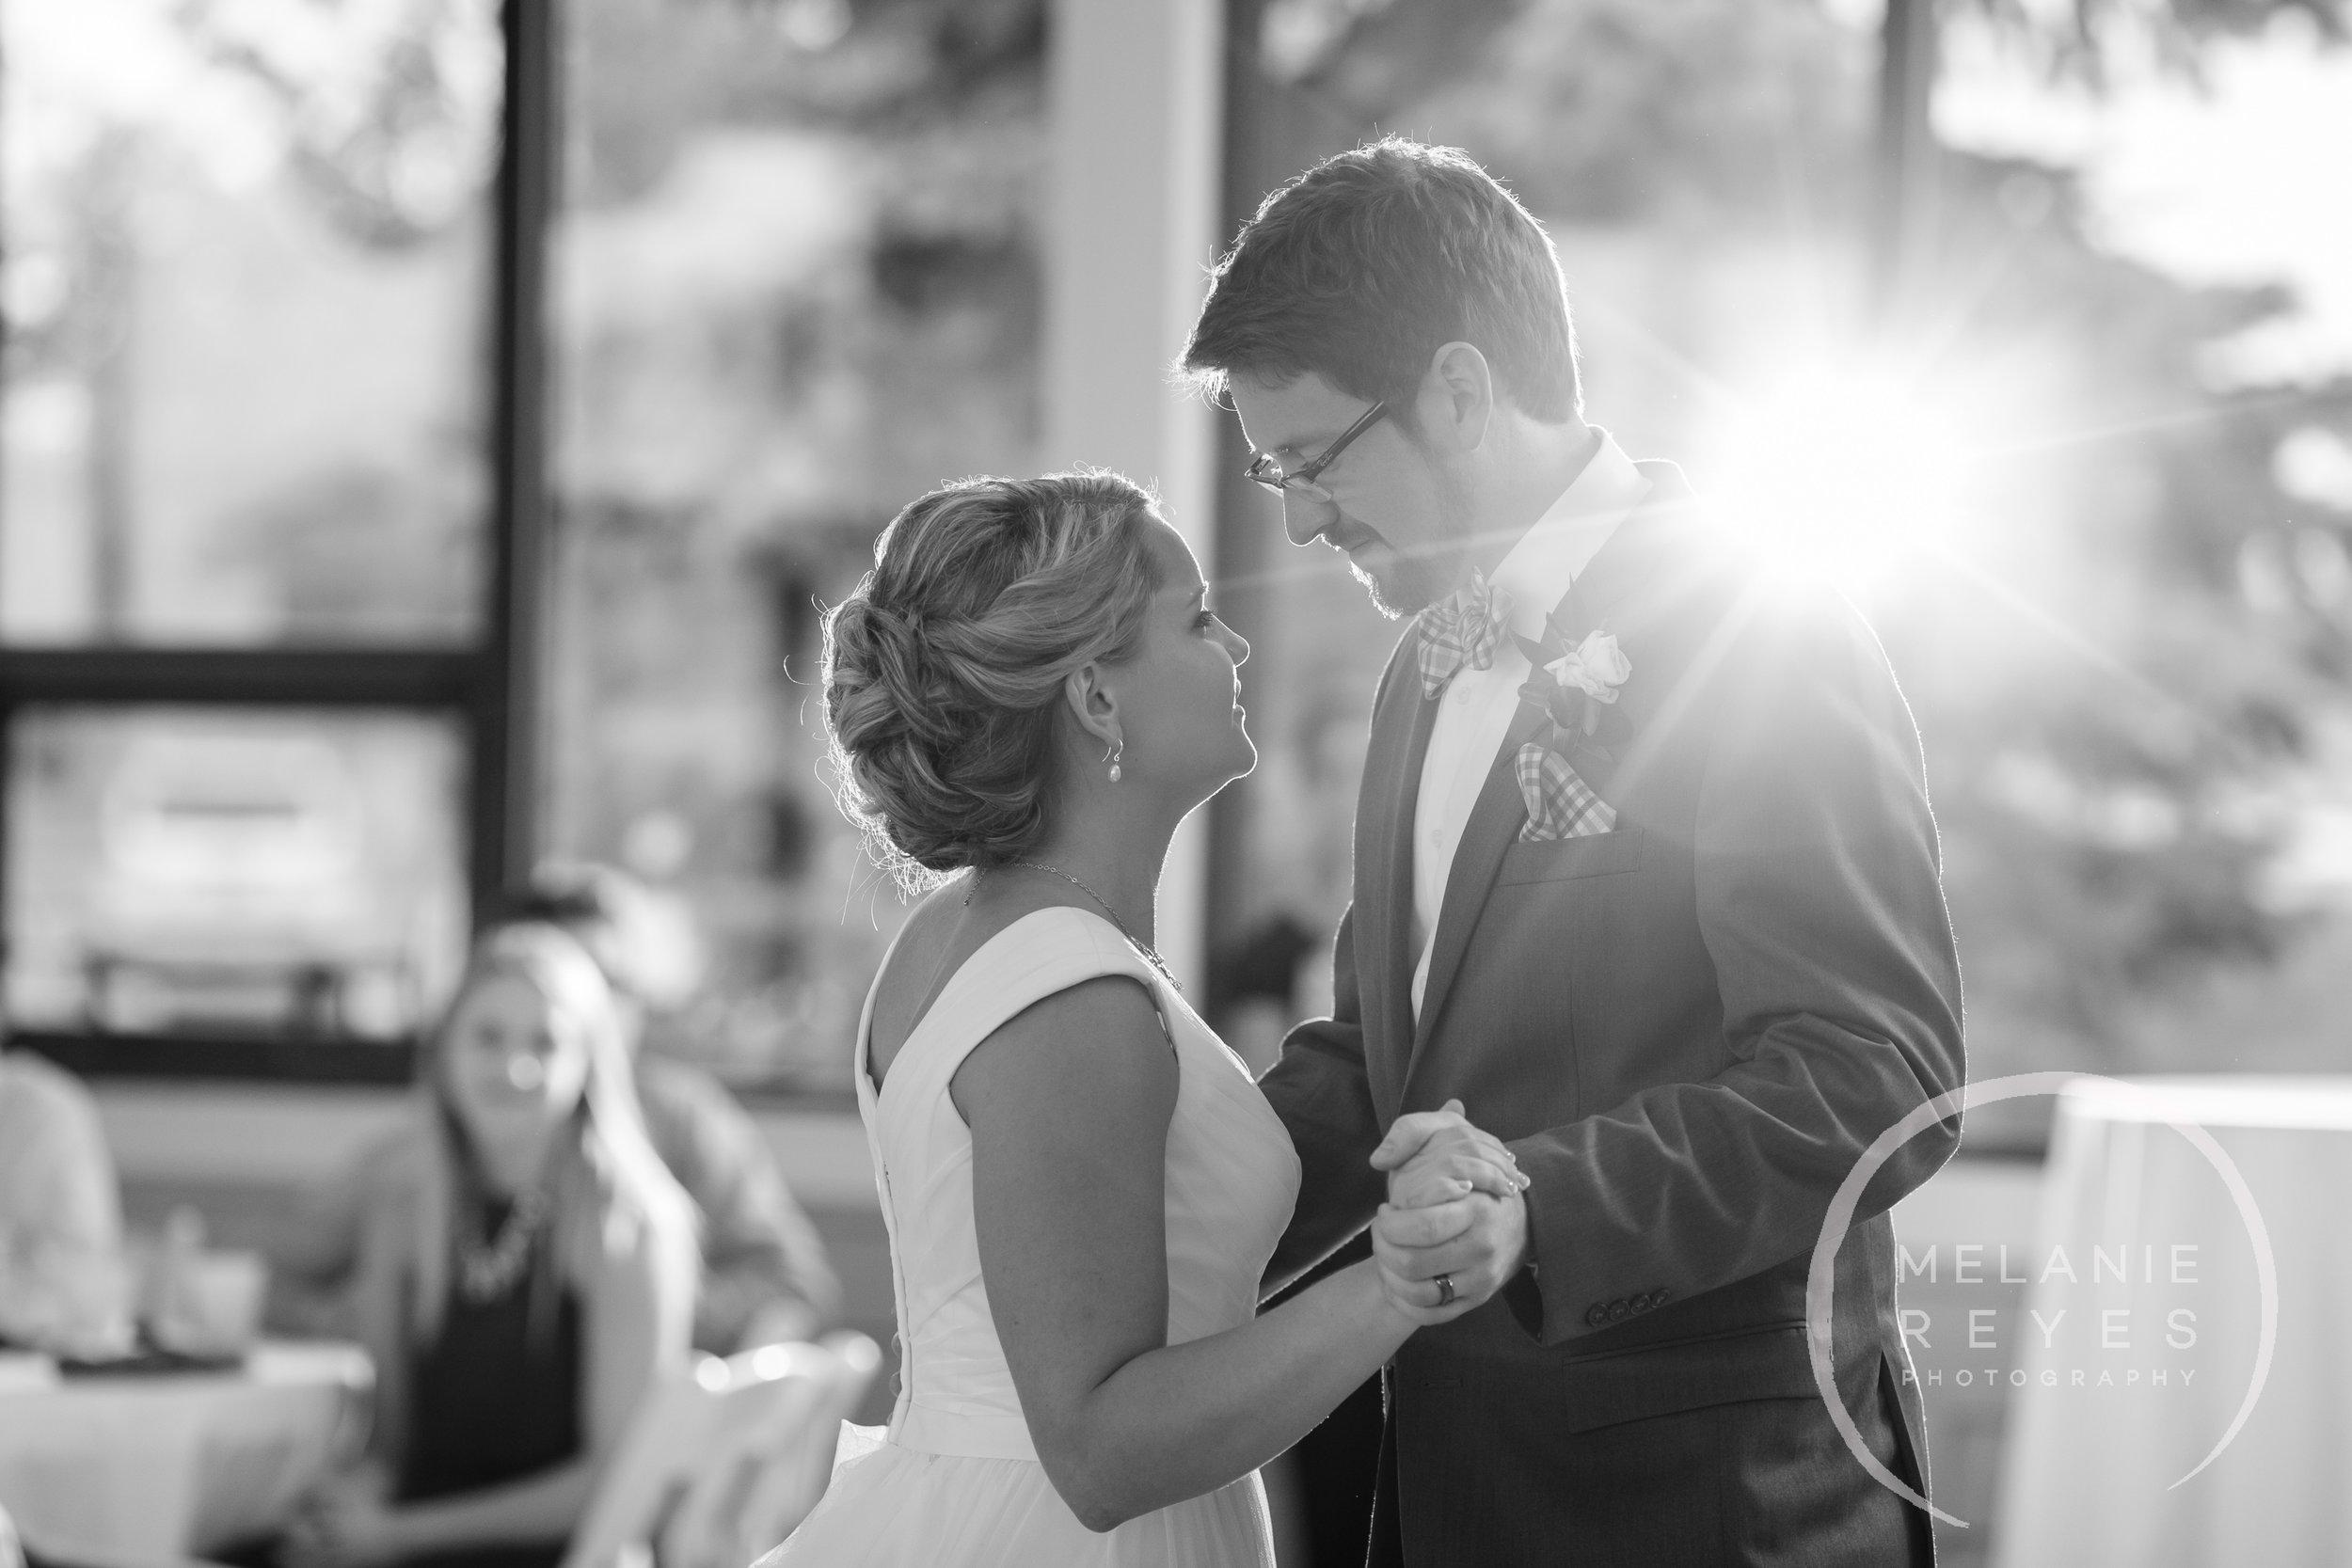 081_grandrapids_wedding_photographer_melaniereyes.JPG